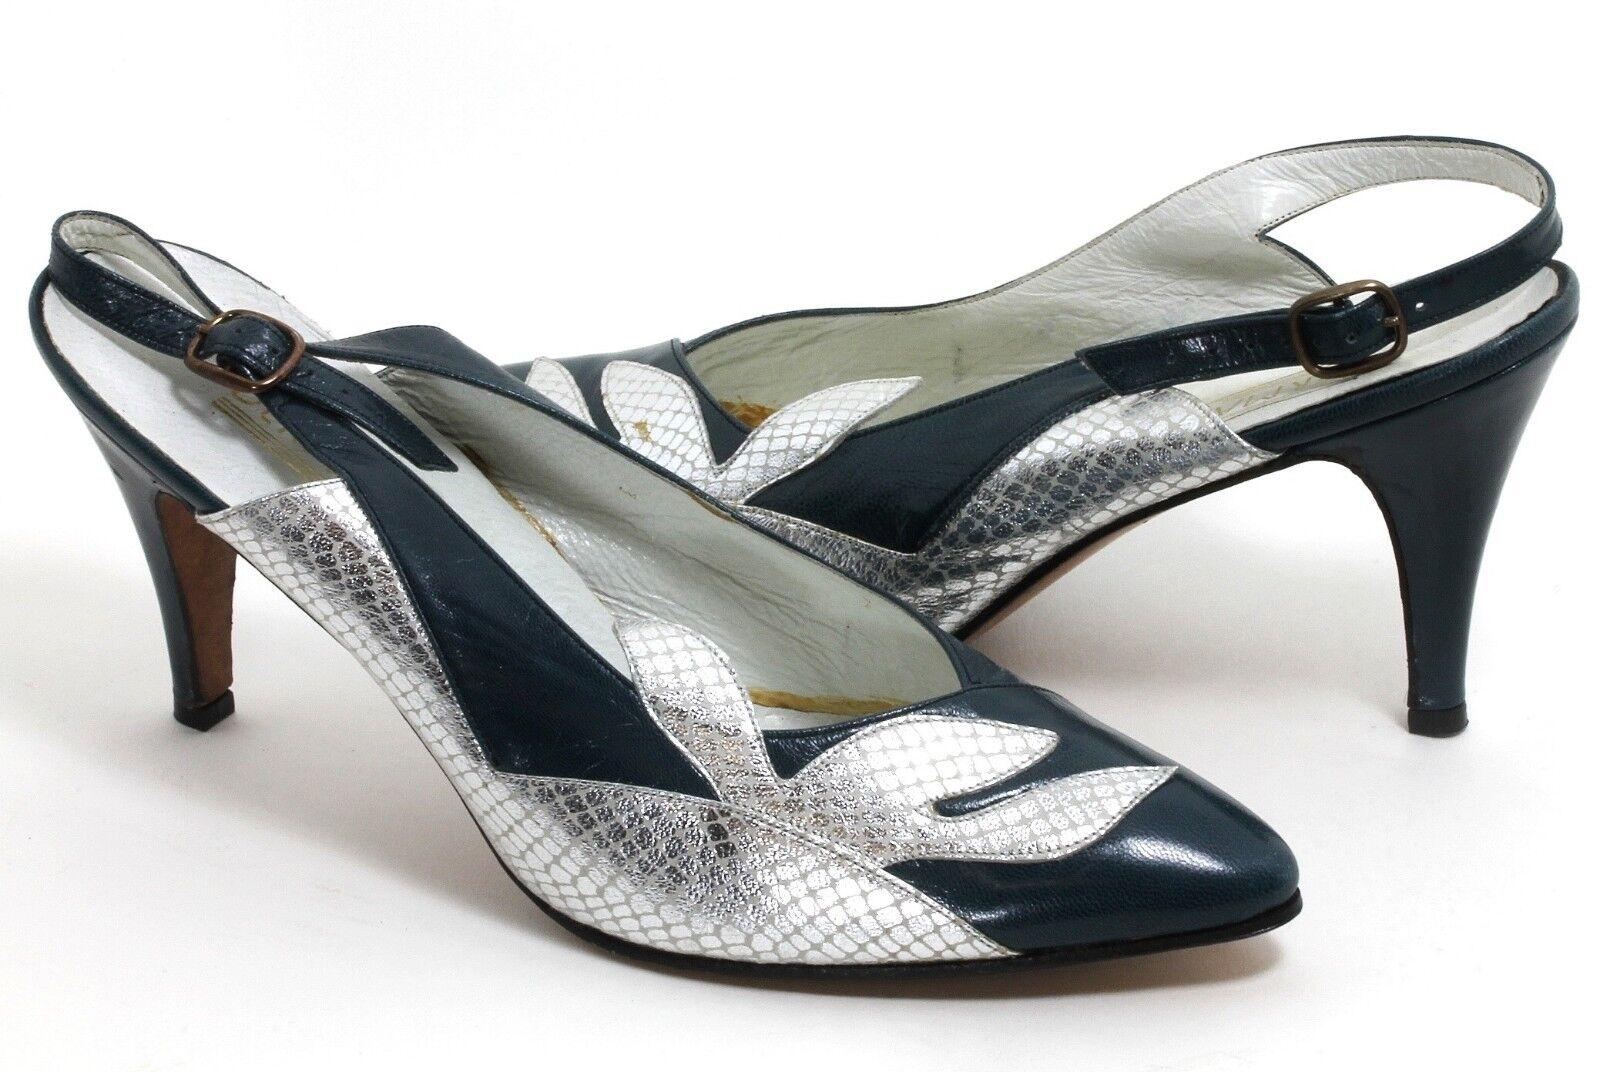 Cinghia Elegante Vintage décolleté Scarpe da donna derma Style METALLIZZATO pelle petrolio 39